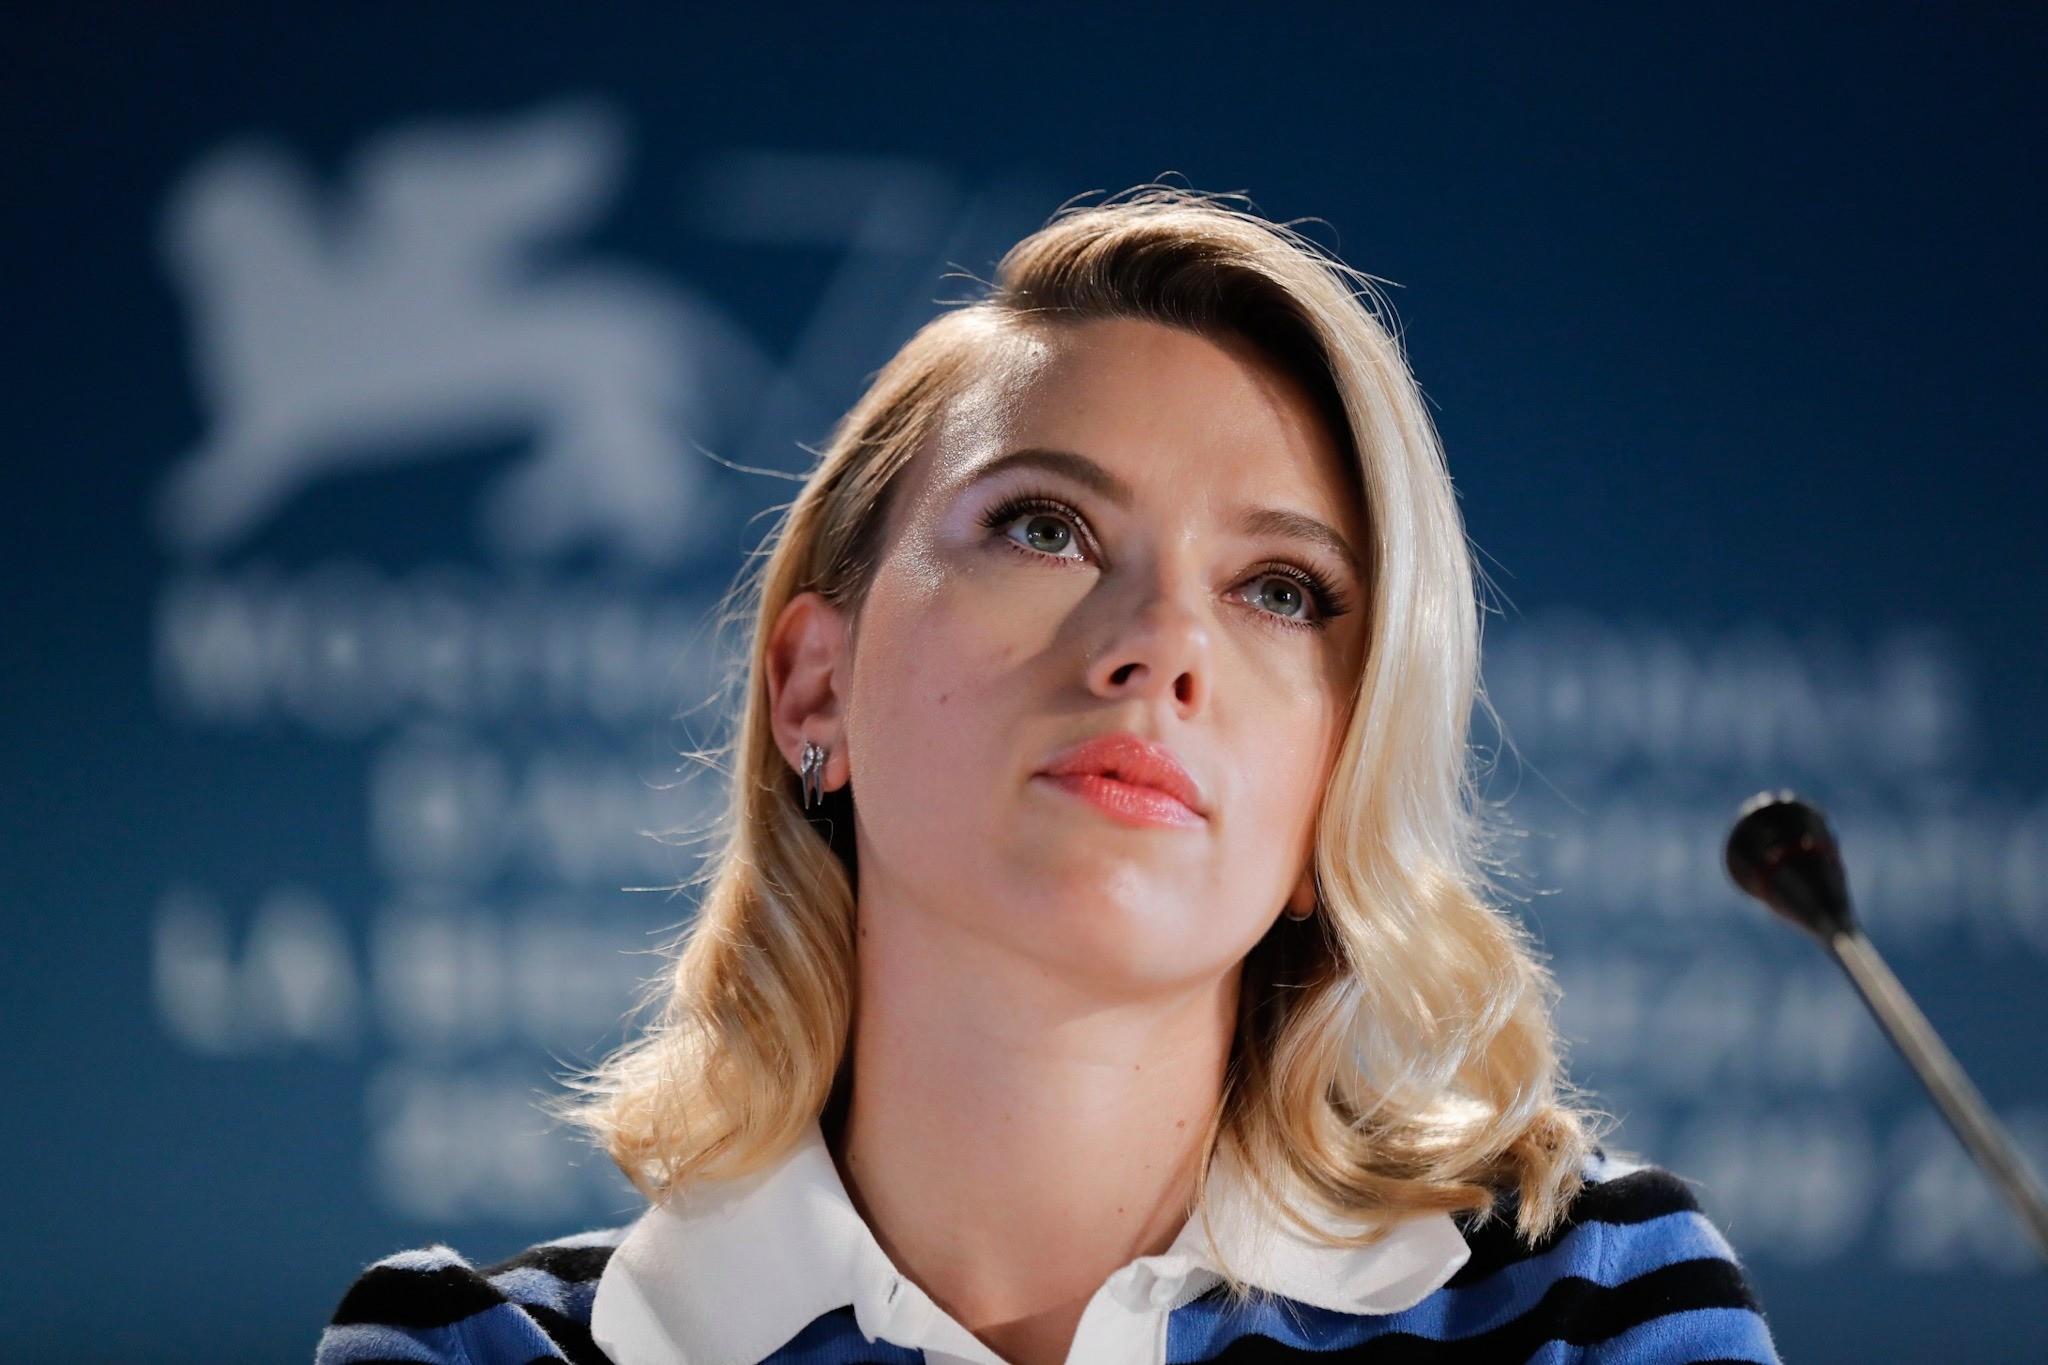 Scarlett Johansson a Venezia 76